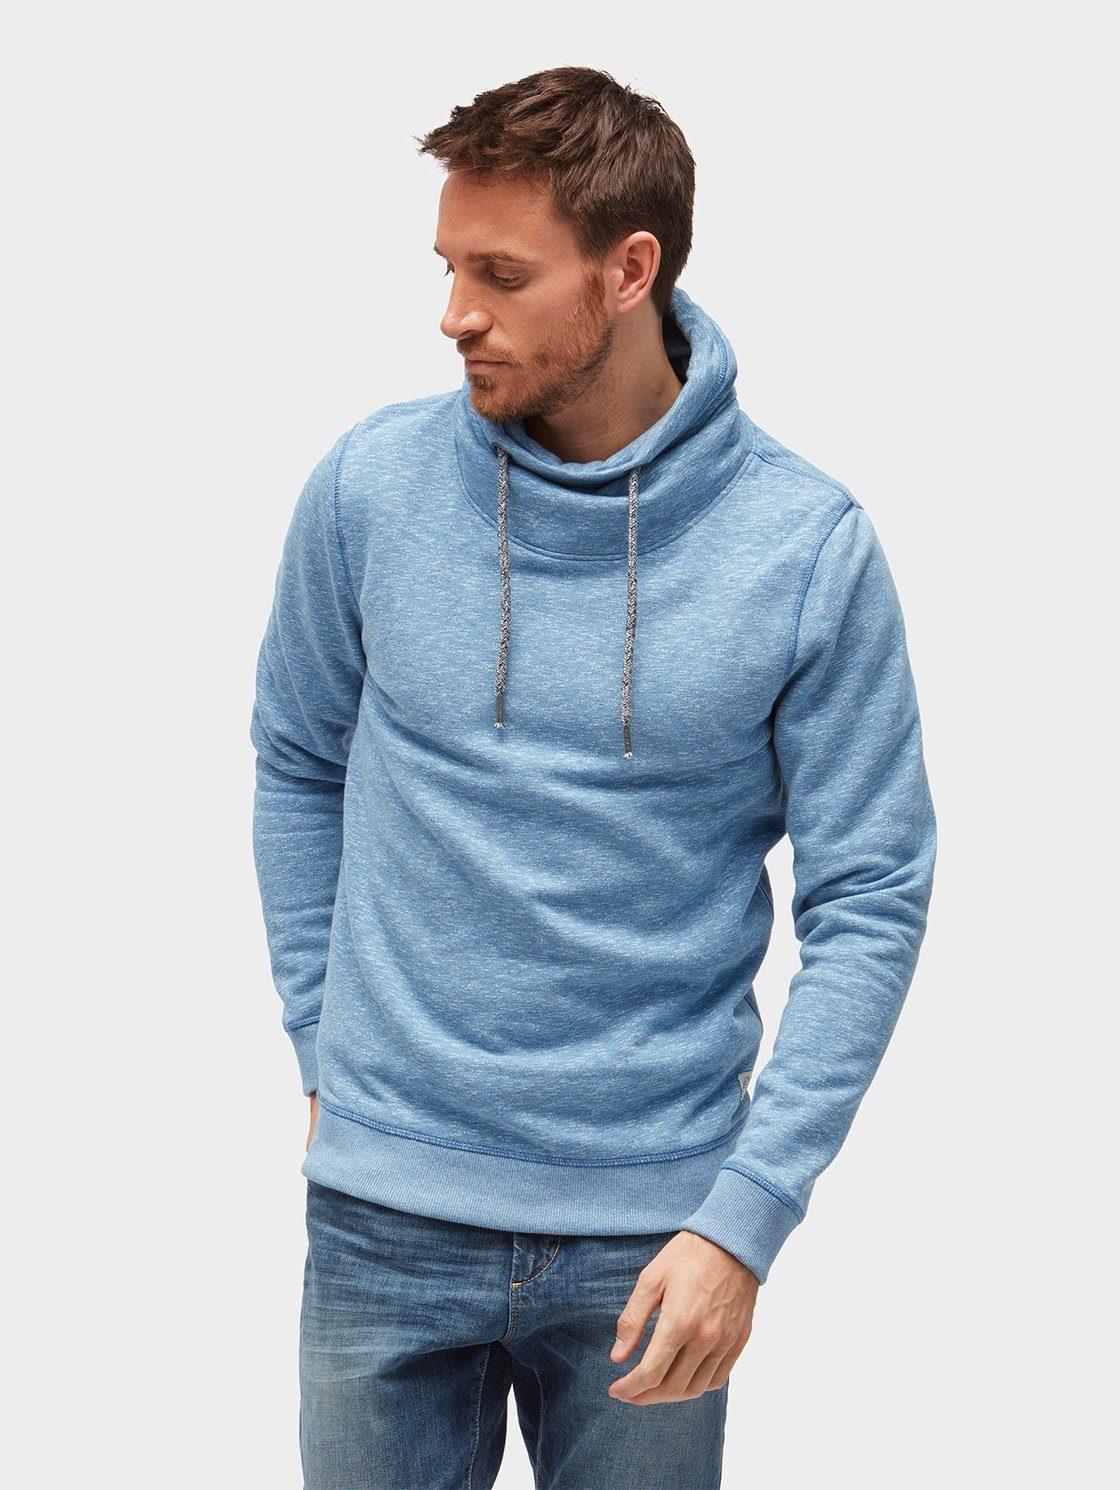 TOM TAILOR Sweater »Sweatshirt in Melange-Optik mit Schlauchkragen«